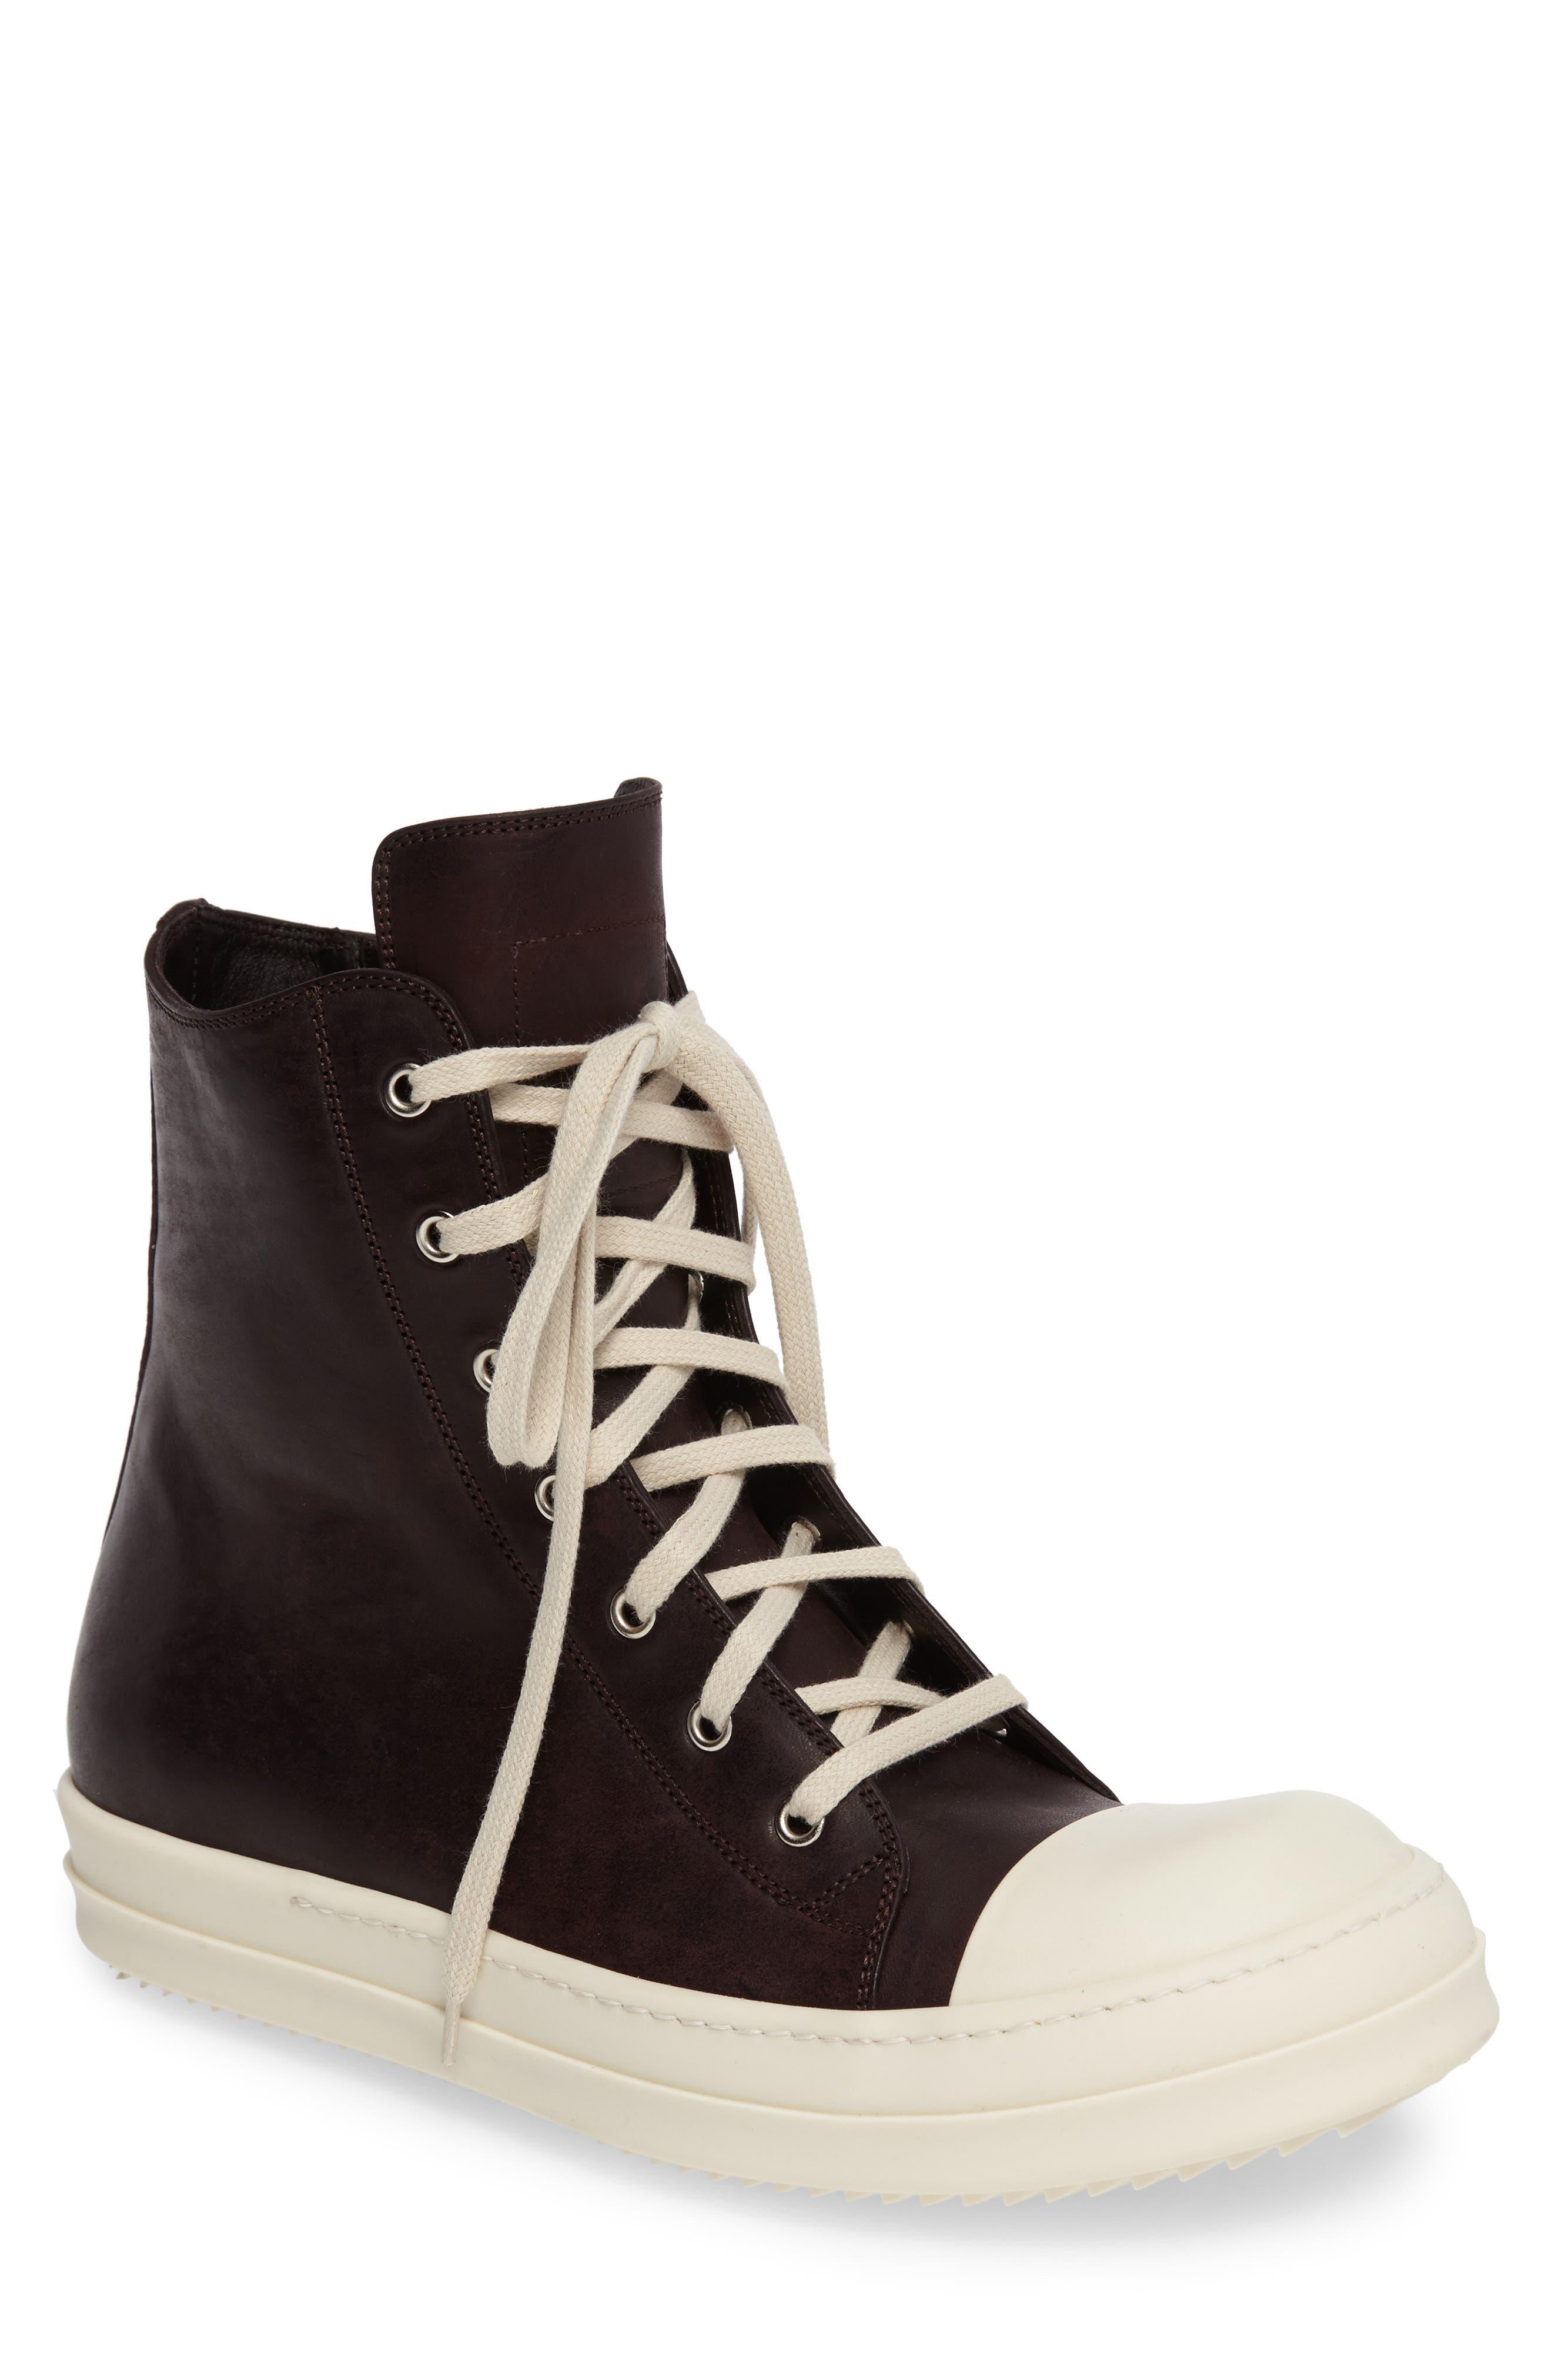 Rick Owens High Top Sneaker (Men)